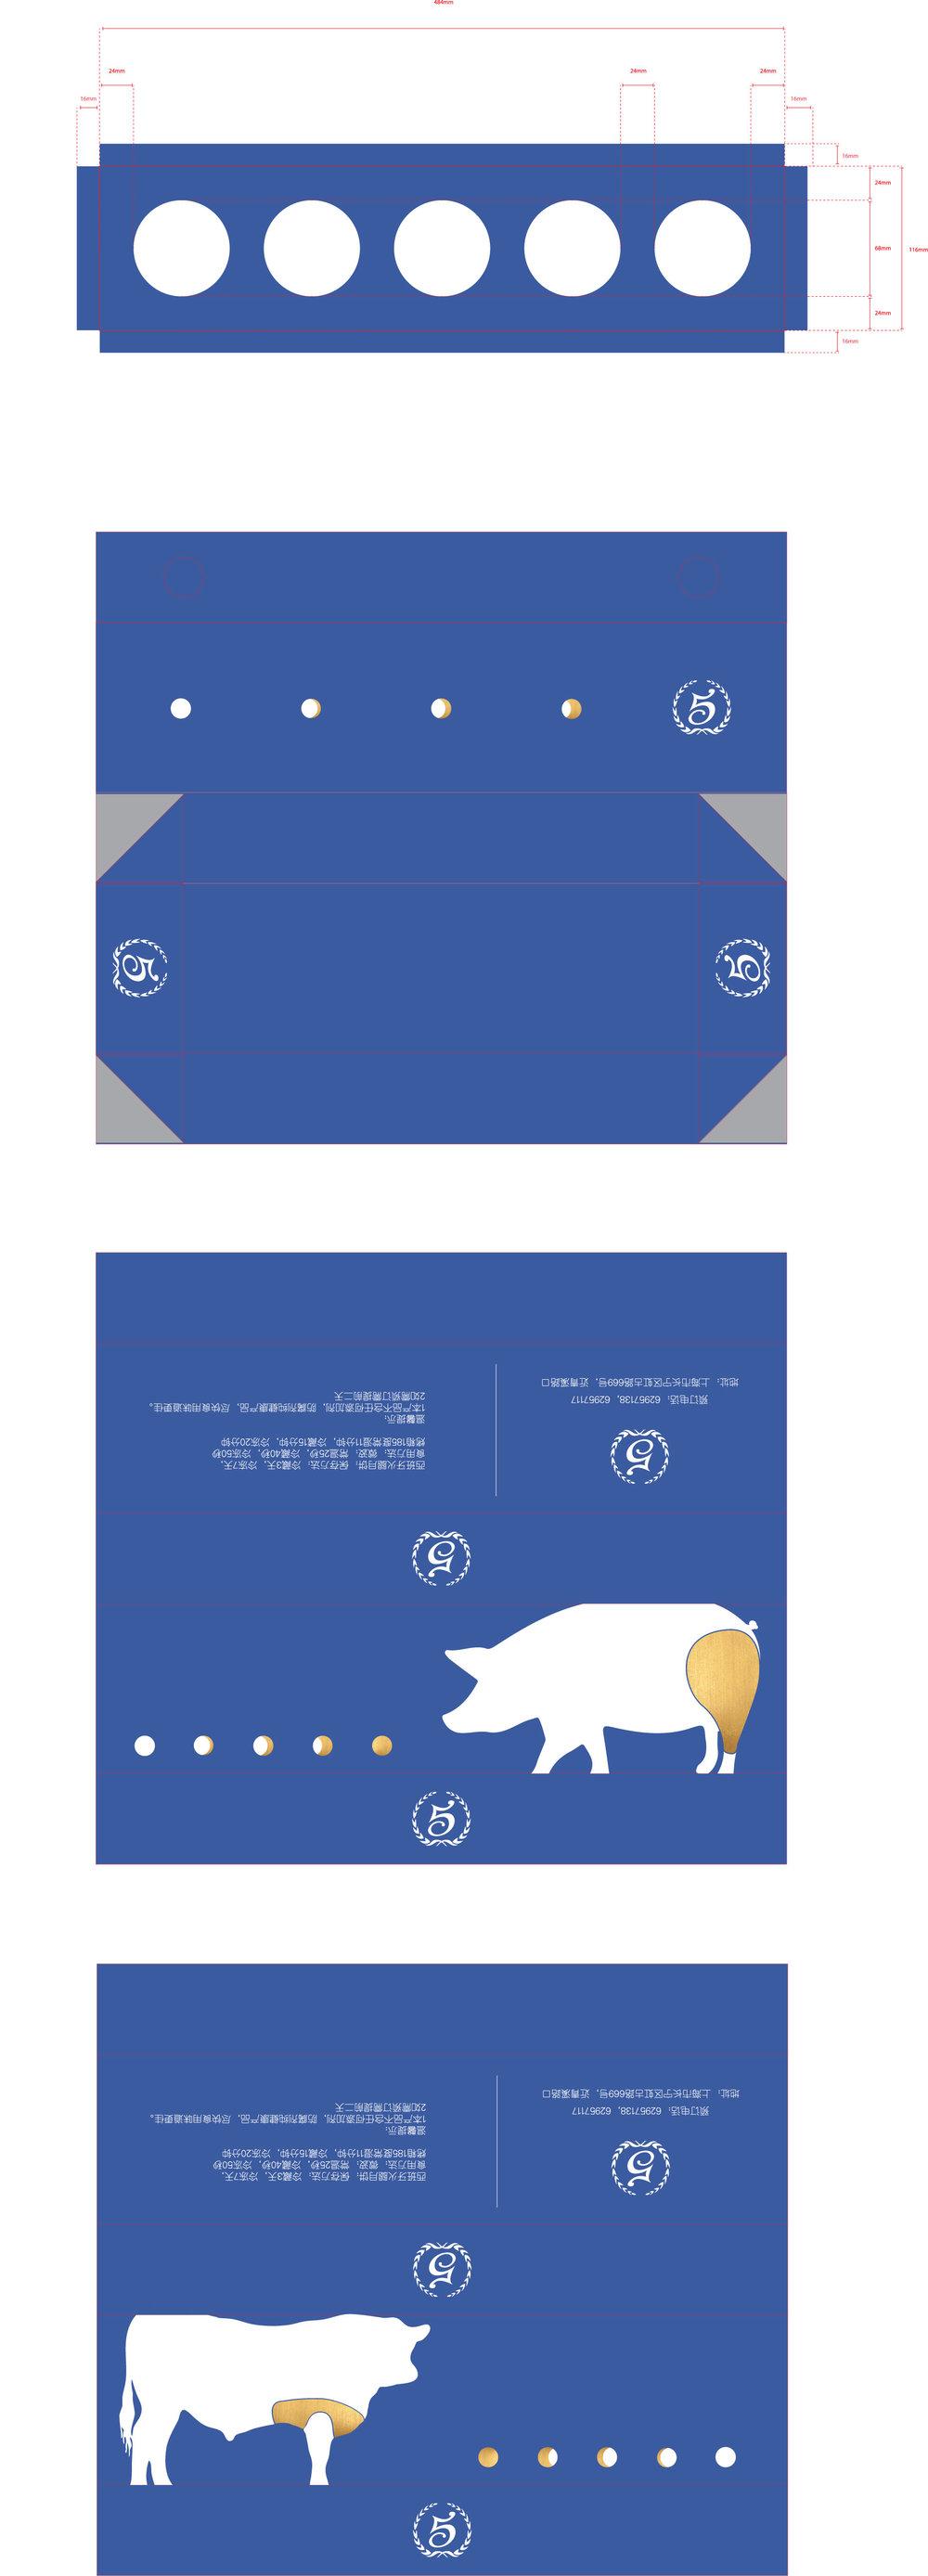 quentin_paquignon-graphicdesign-maggie5_06.png